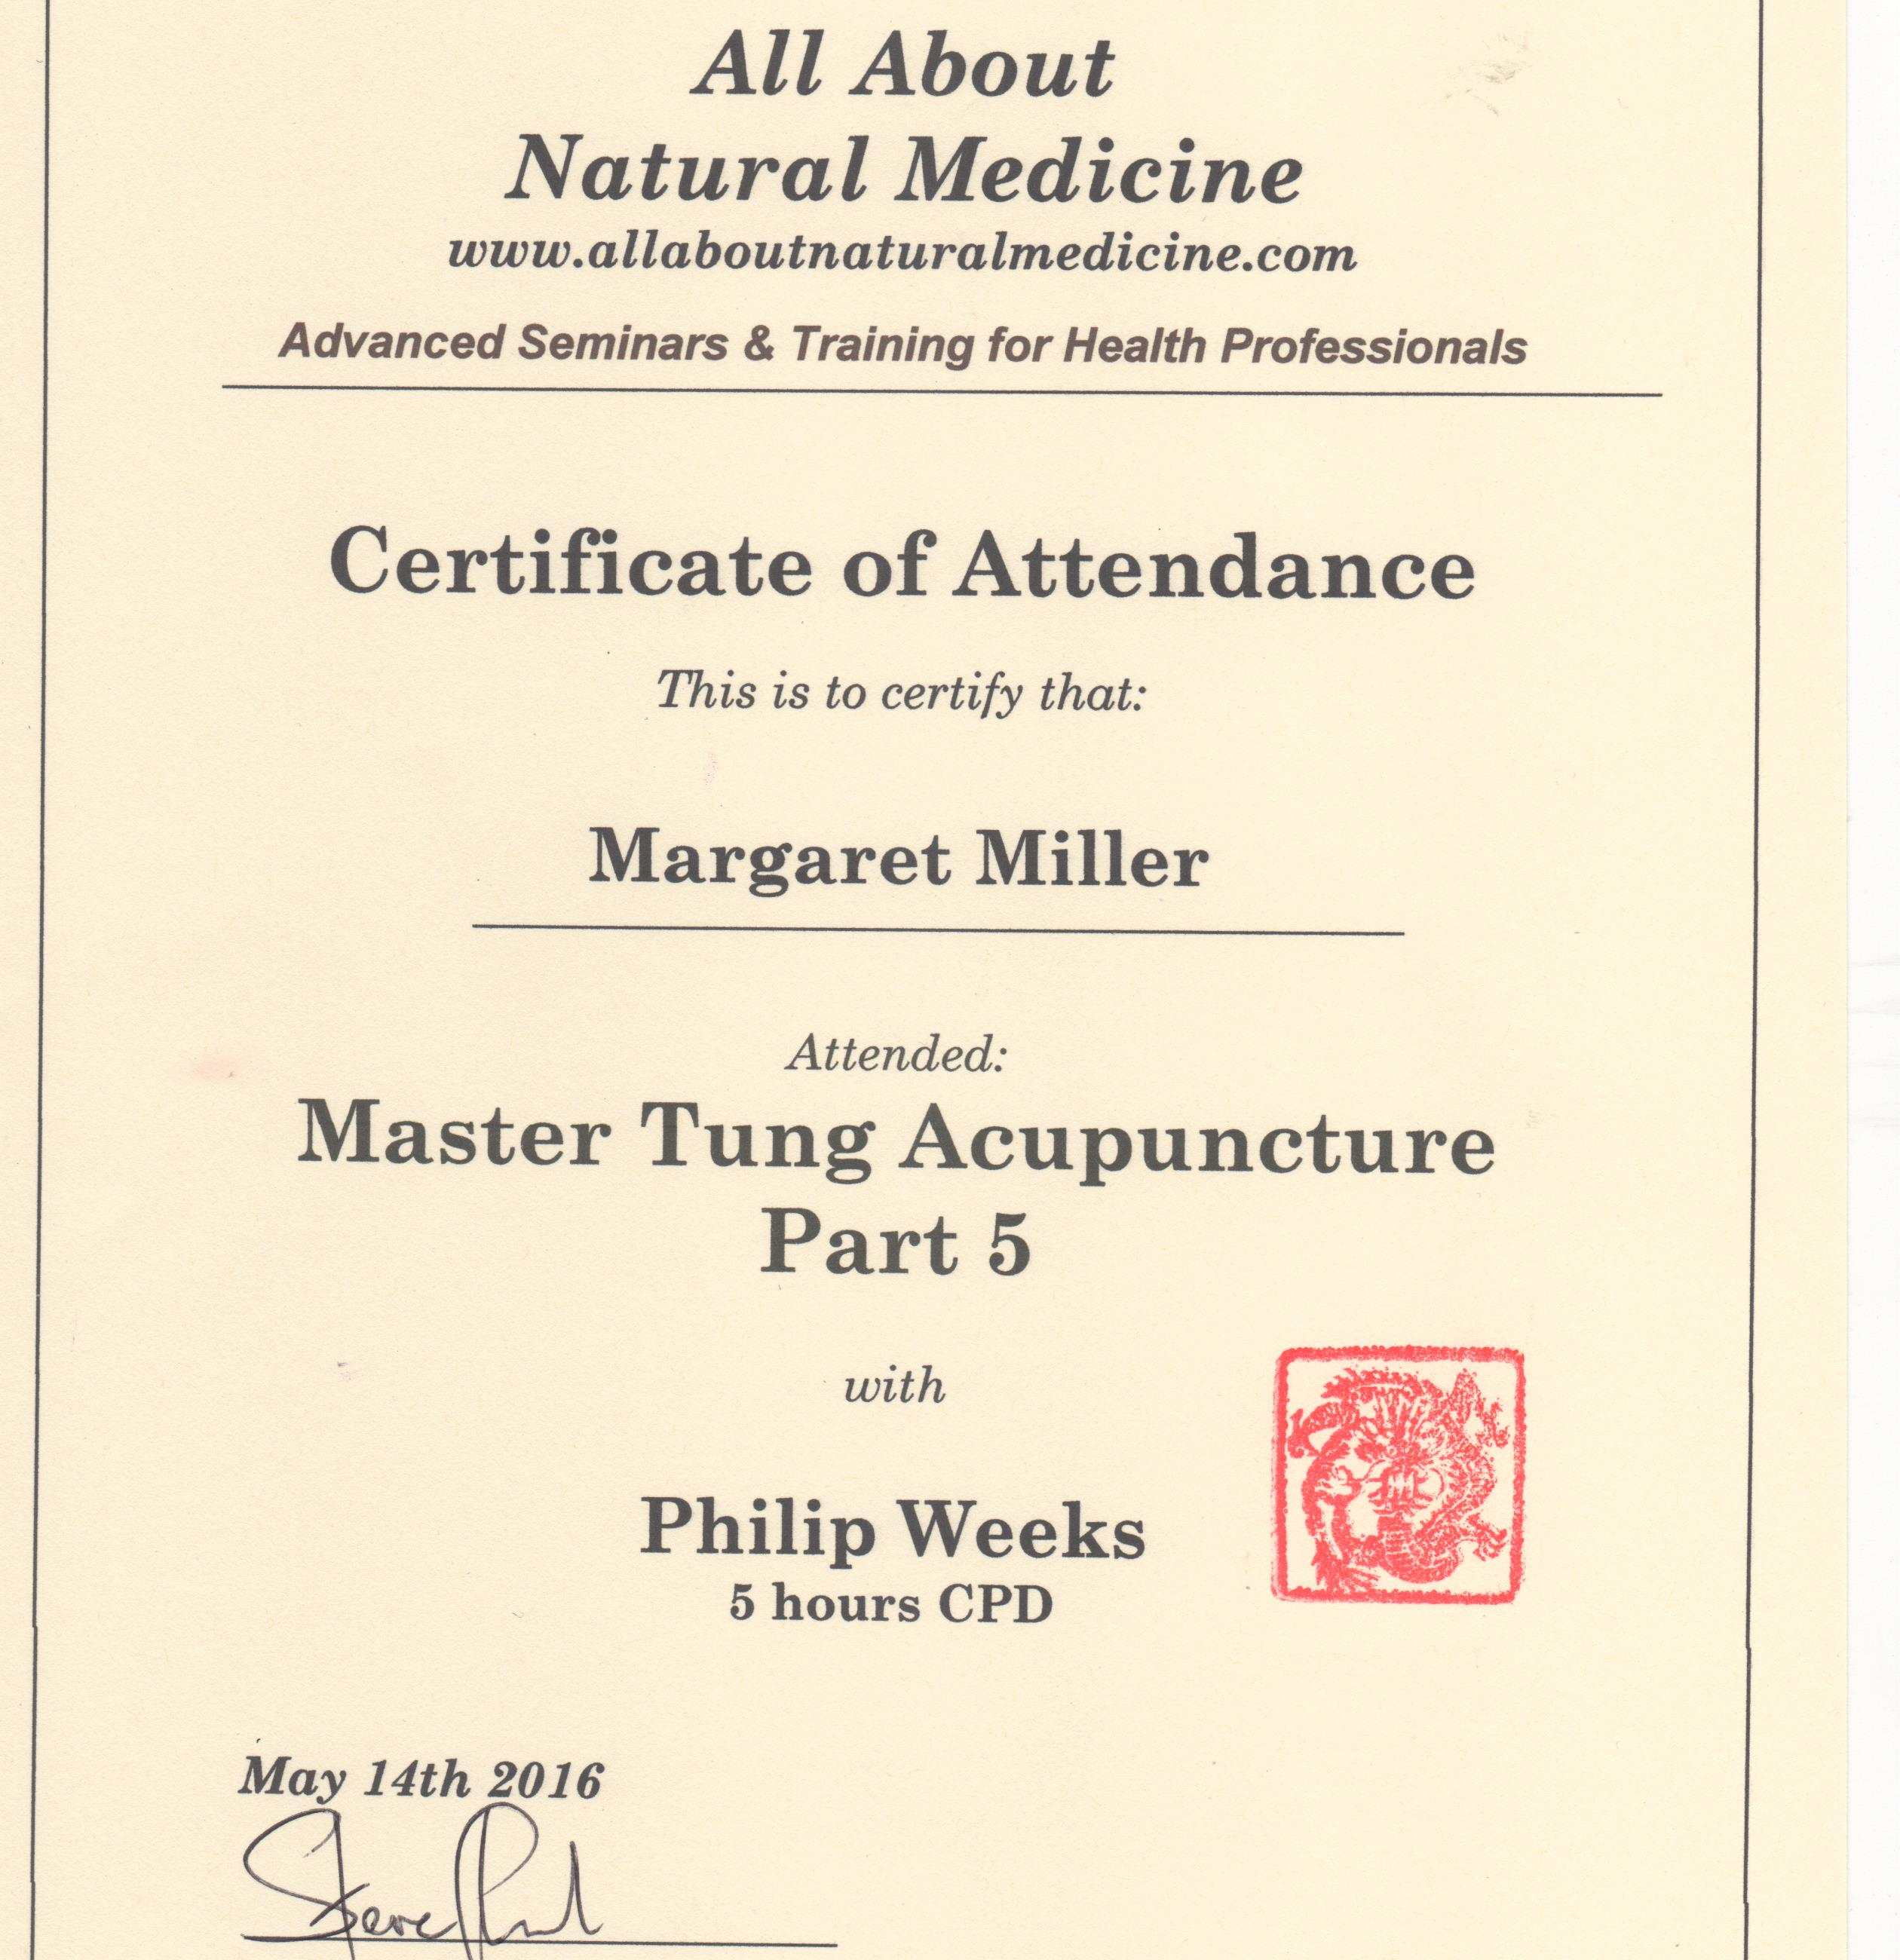 Acupuncture Certification Gallery - creative certificate